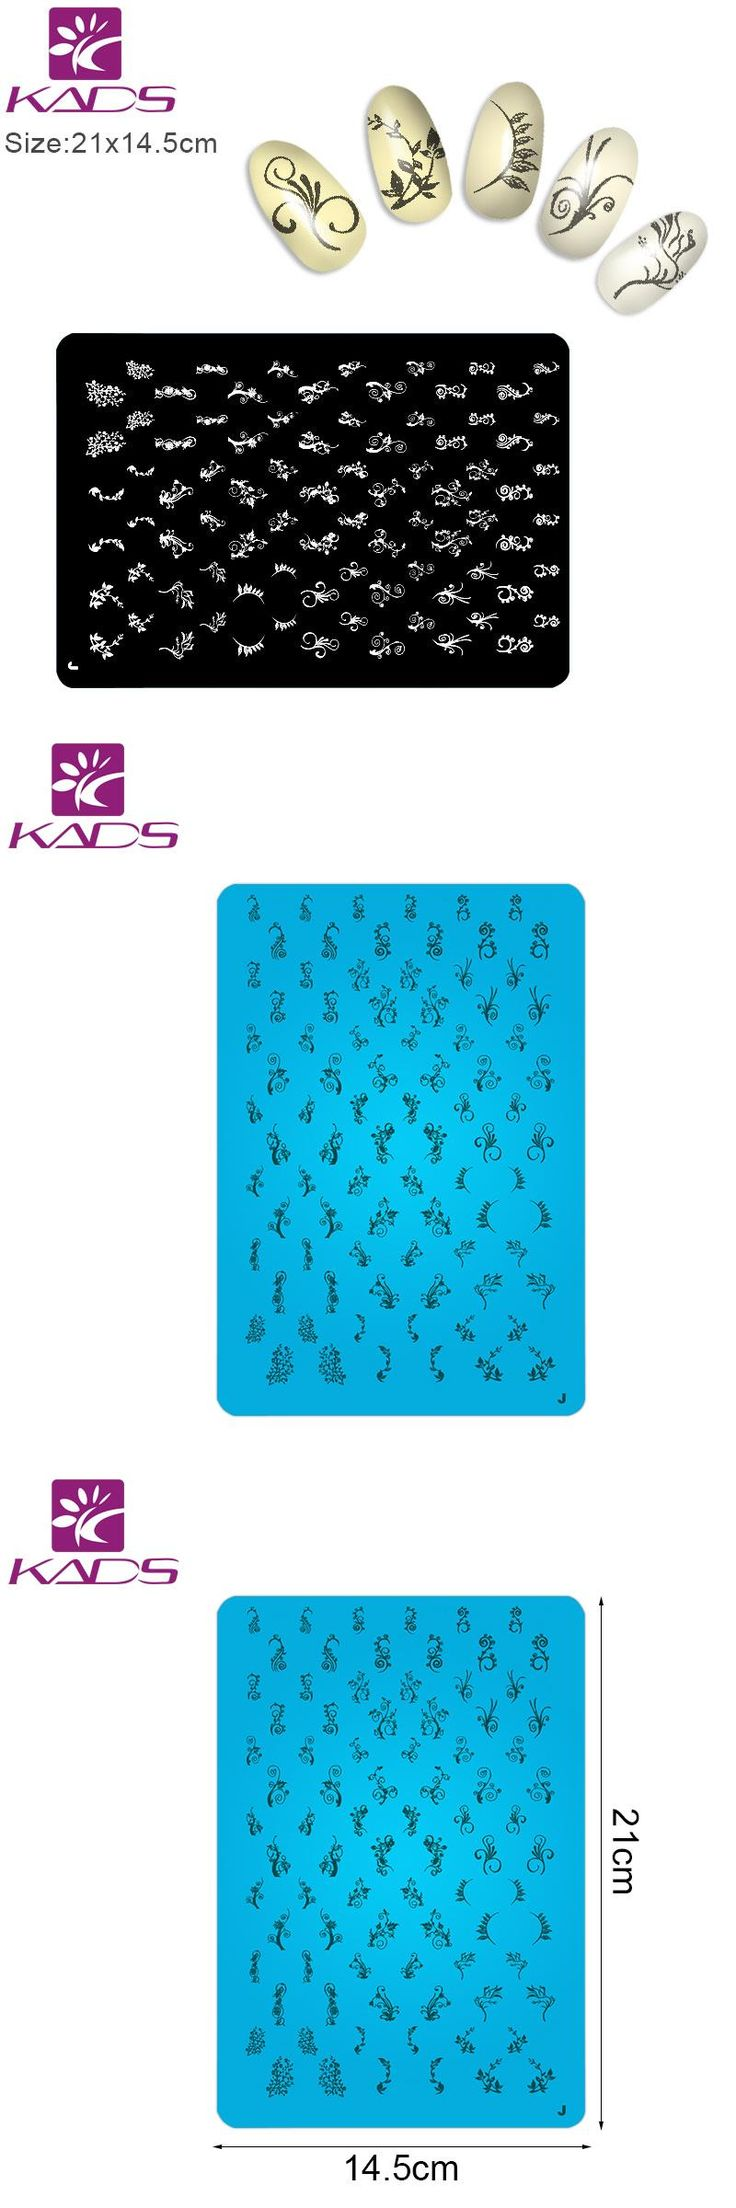 [Visit to Buy] KADS 1Pcs Nail Stamp For DIY Nail Stamping Plates New Arrival Stamper Nail Art Konad Stamping NaiI Stamper Nail Art #Advertisement